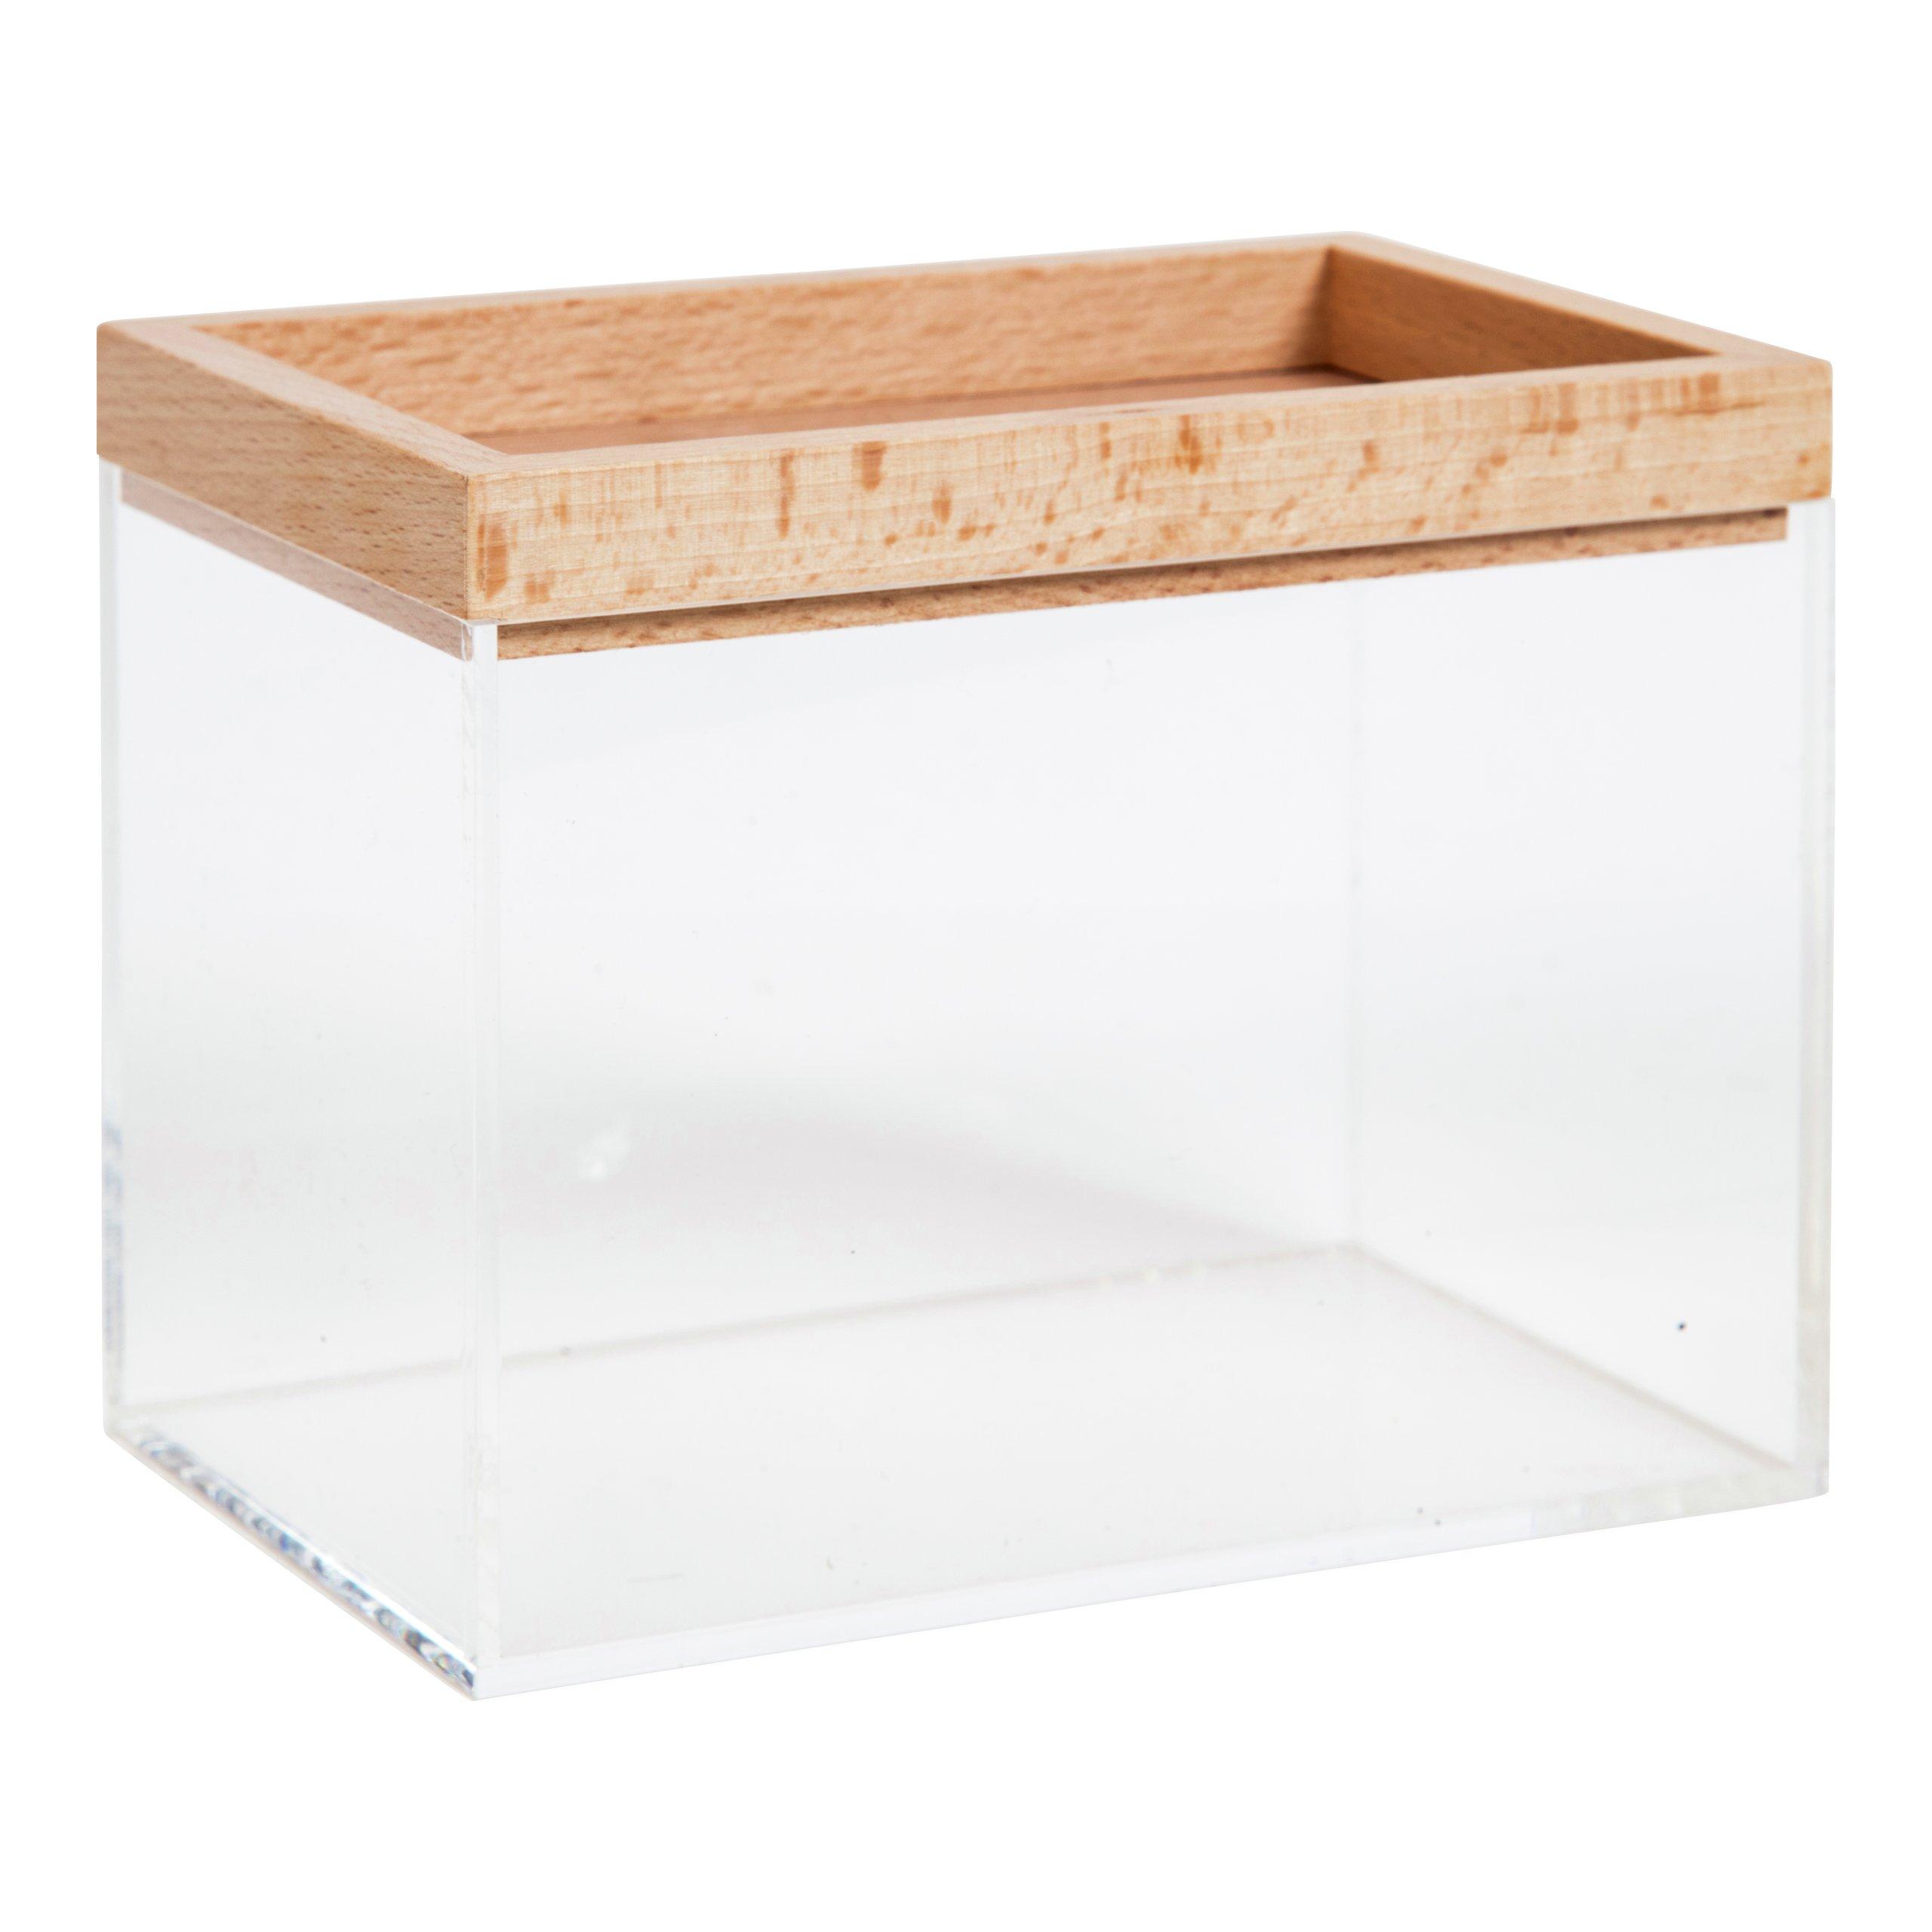 Akrylboks-BOX3052